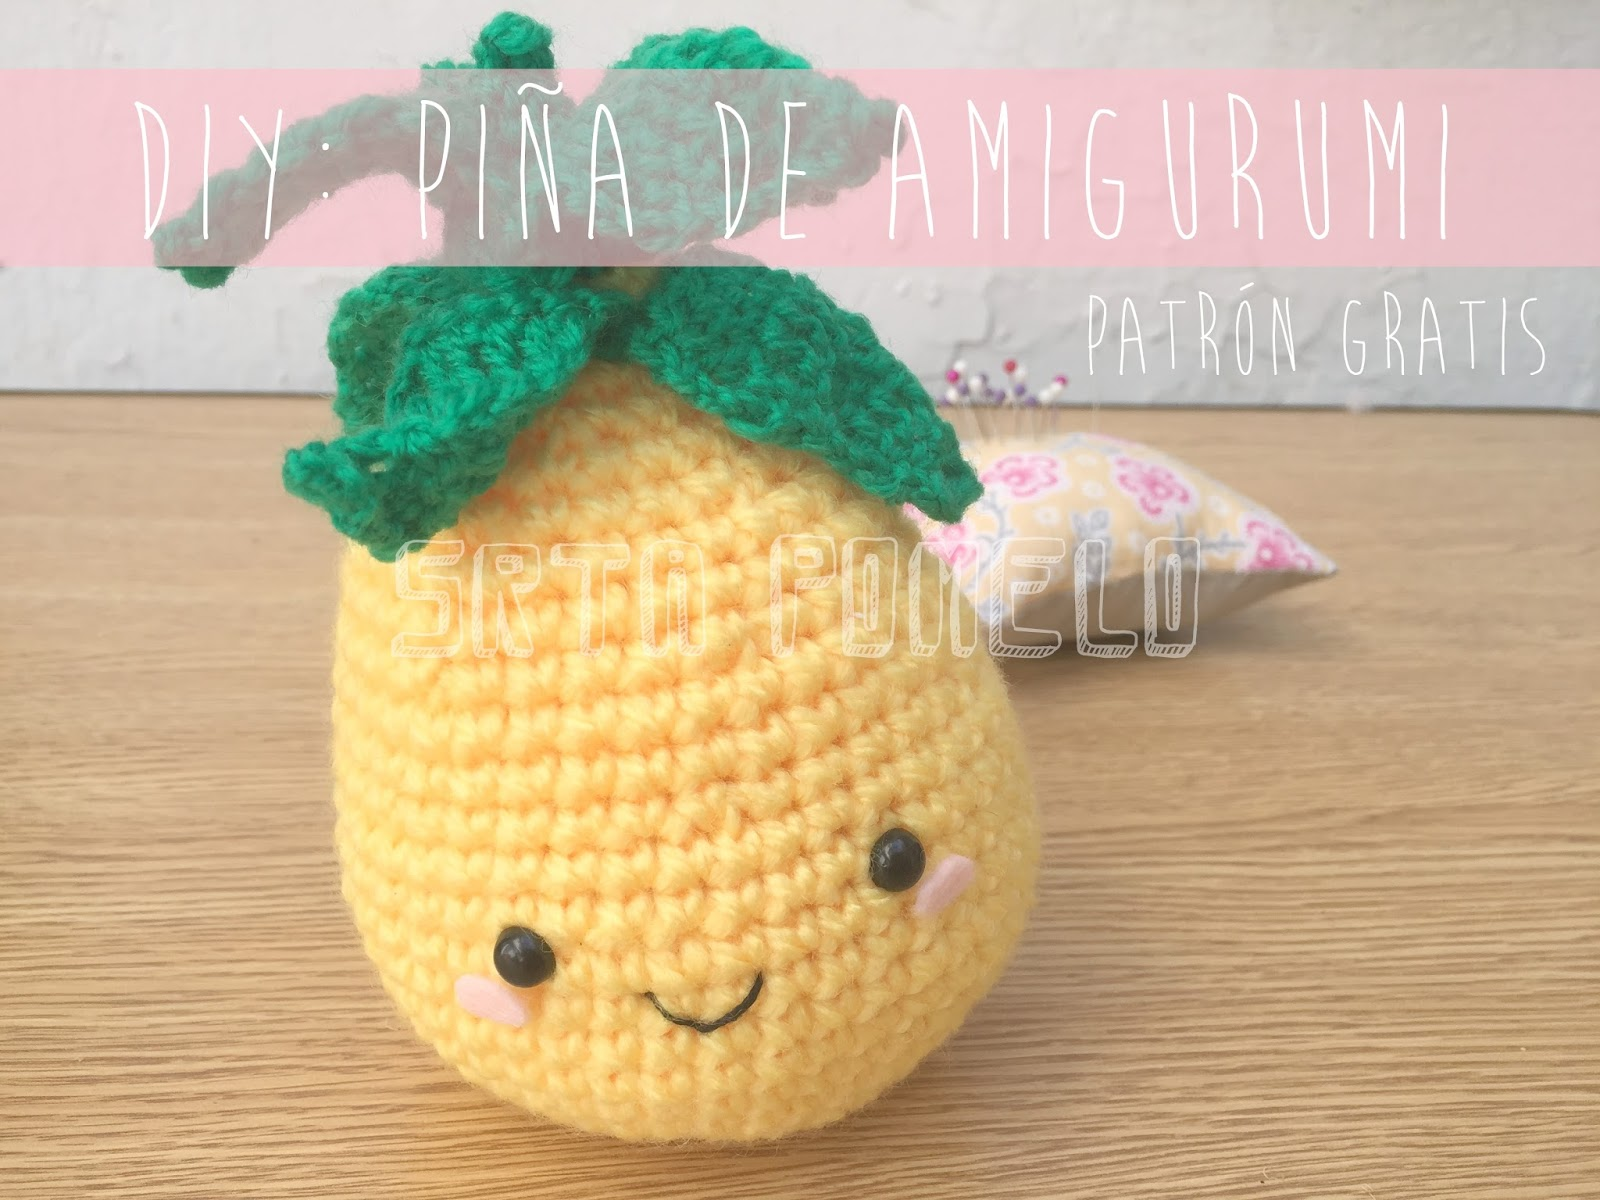 Srta Pomelo: Piña de amigurumi. Patrón gratis.